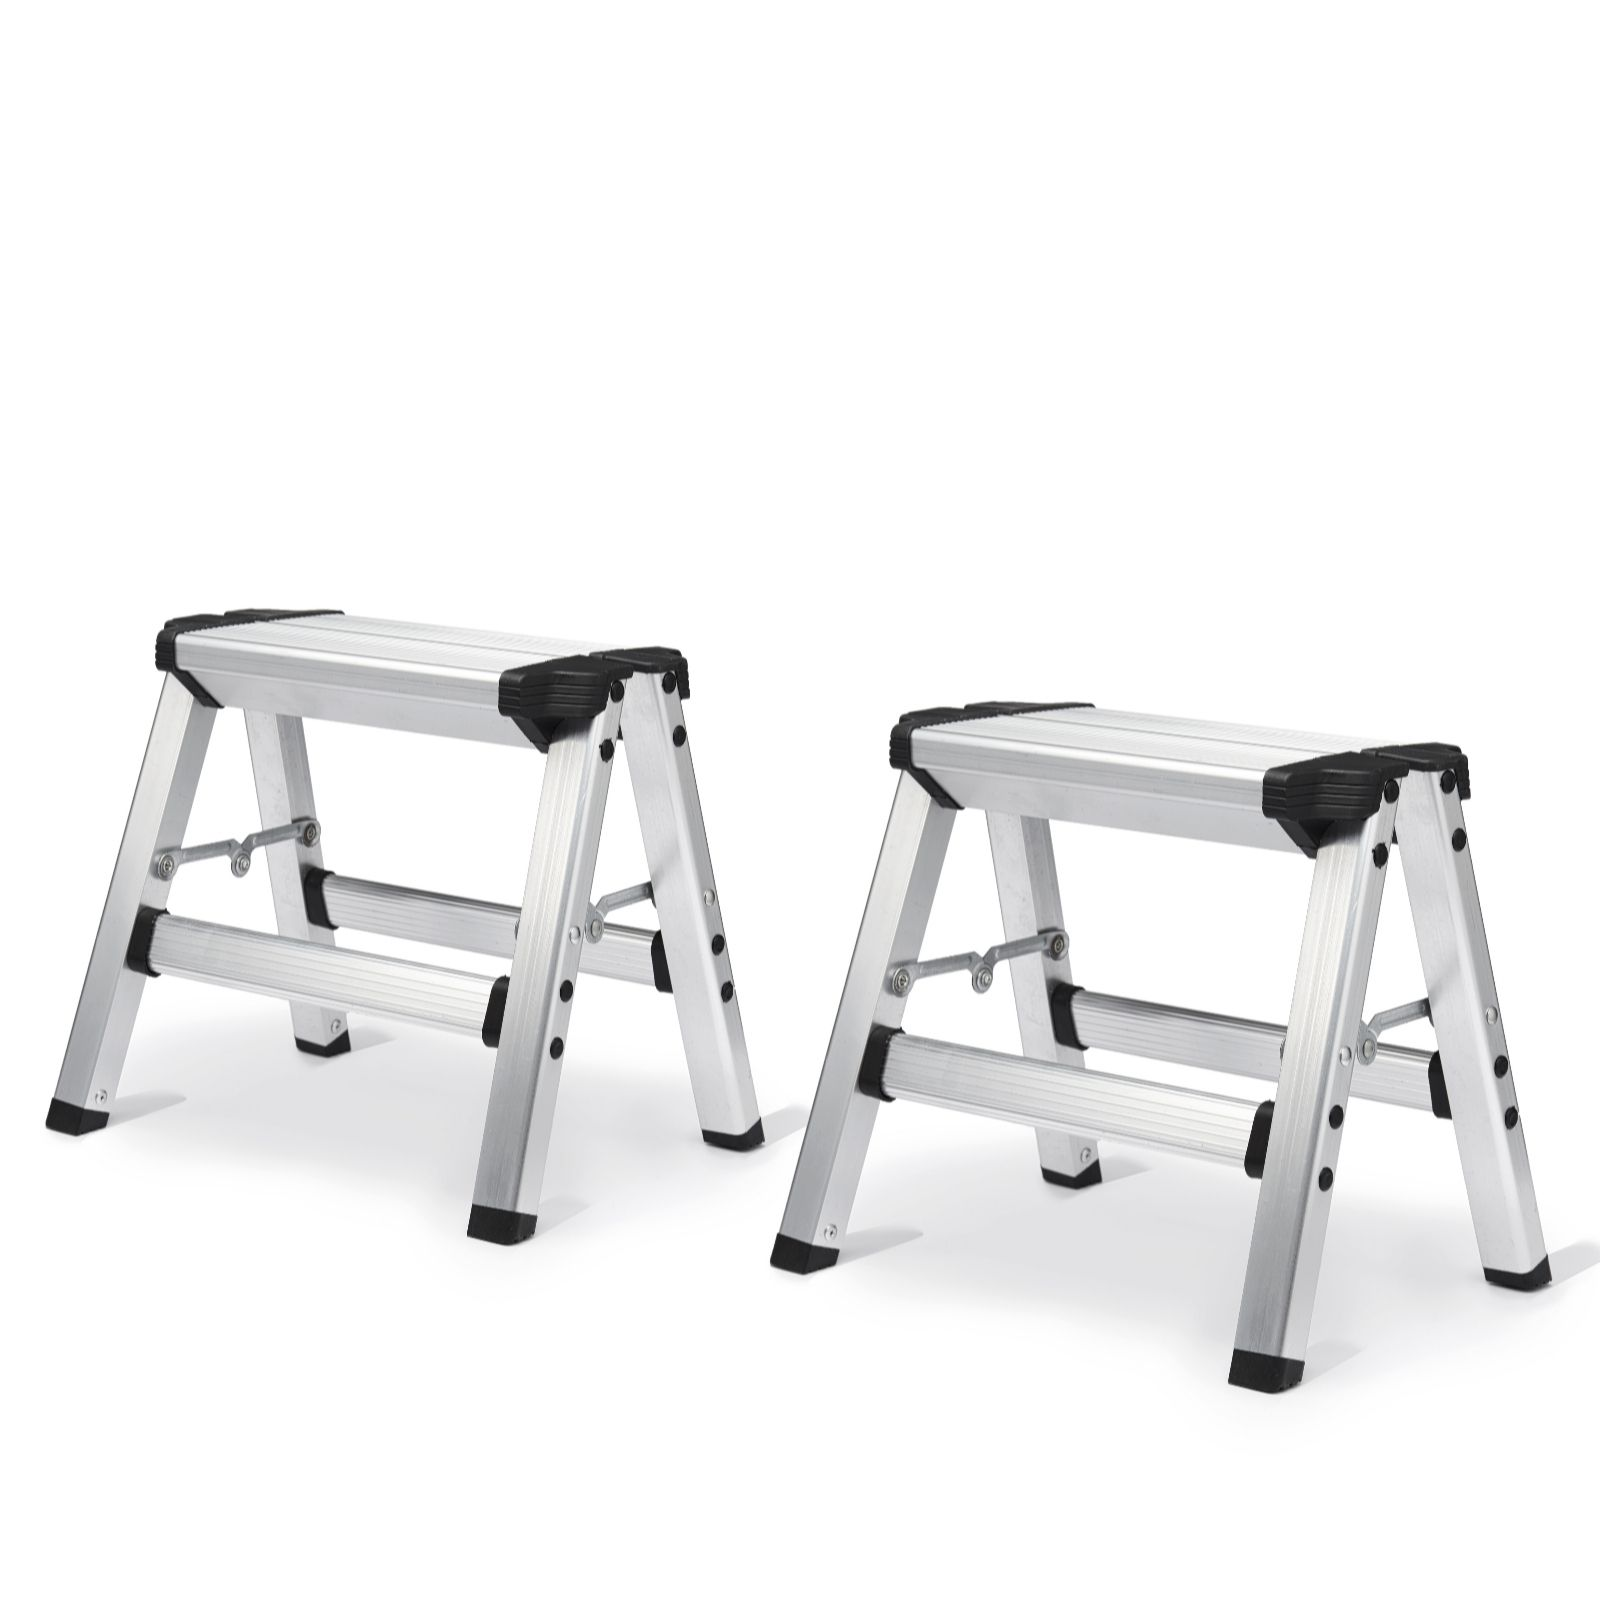 Admirable Buildcraft Set Of 2 Two Step Folding Step Stool Qvc Uk Lamtechconsult Wood Chair Design Ideas Lamtechconsultcom